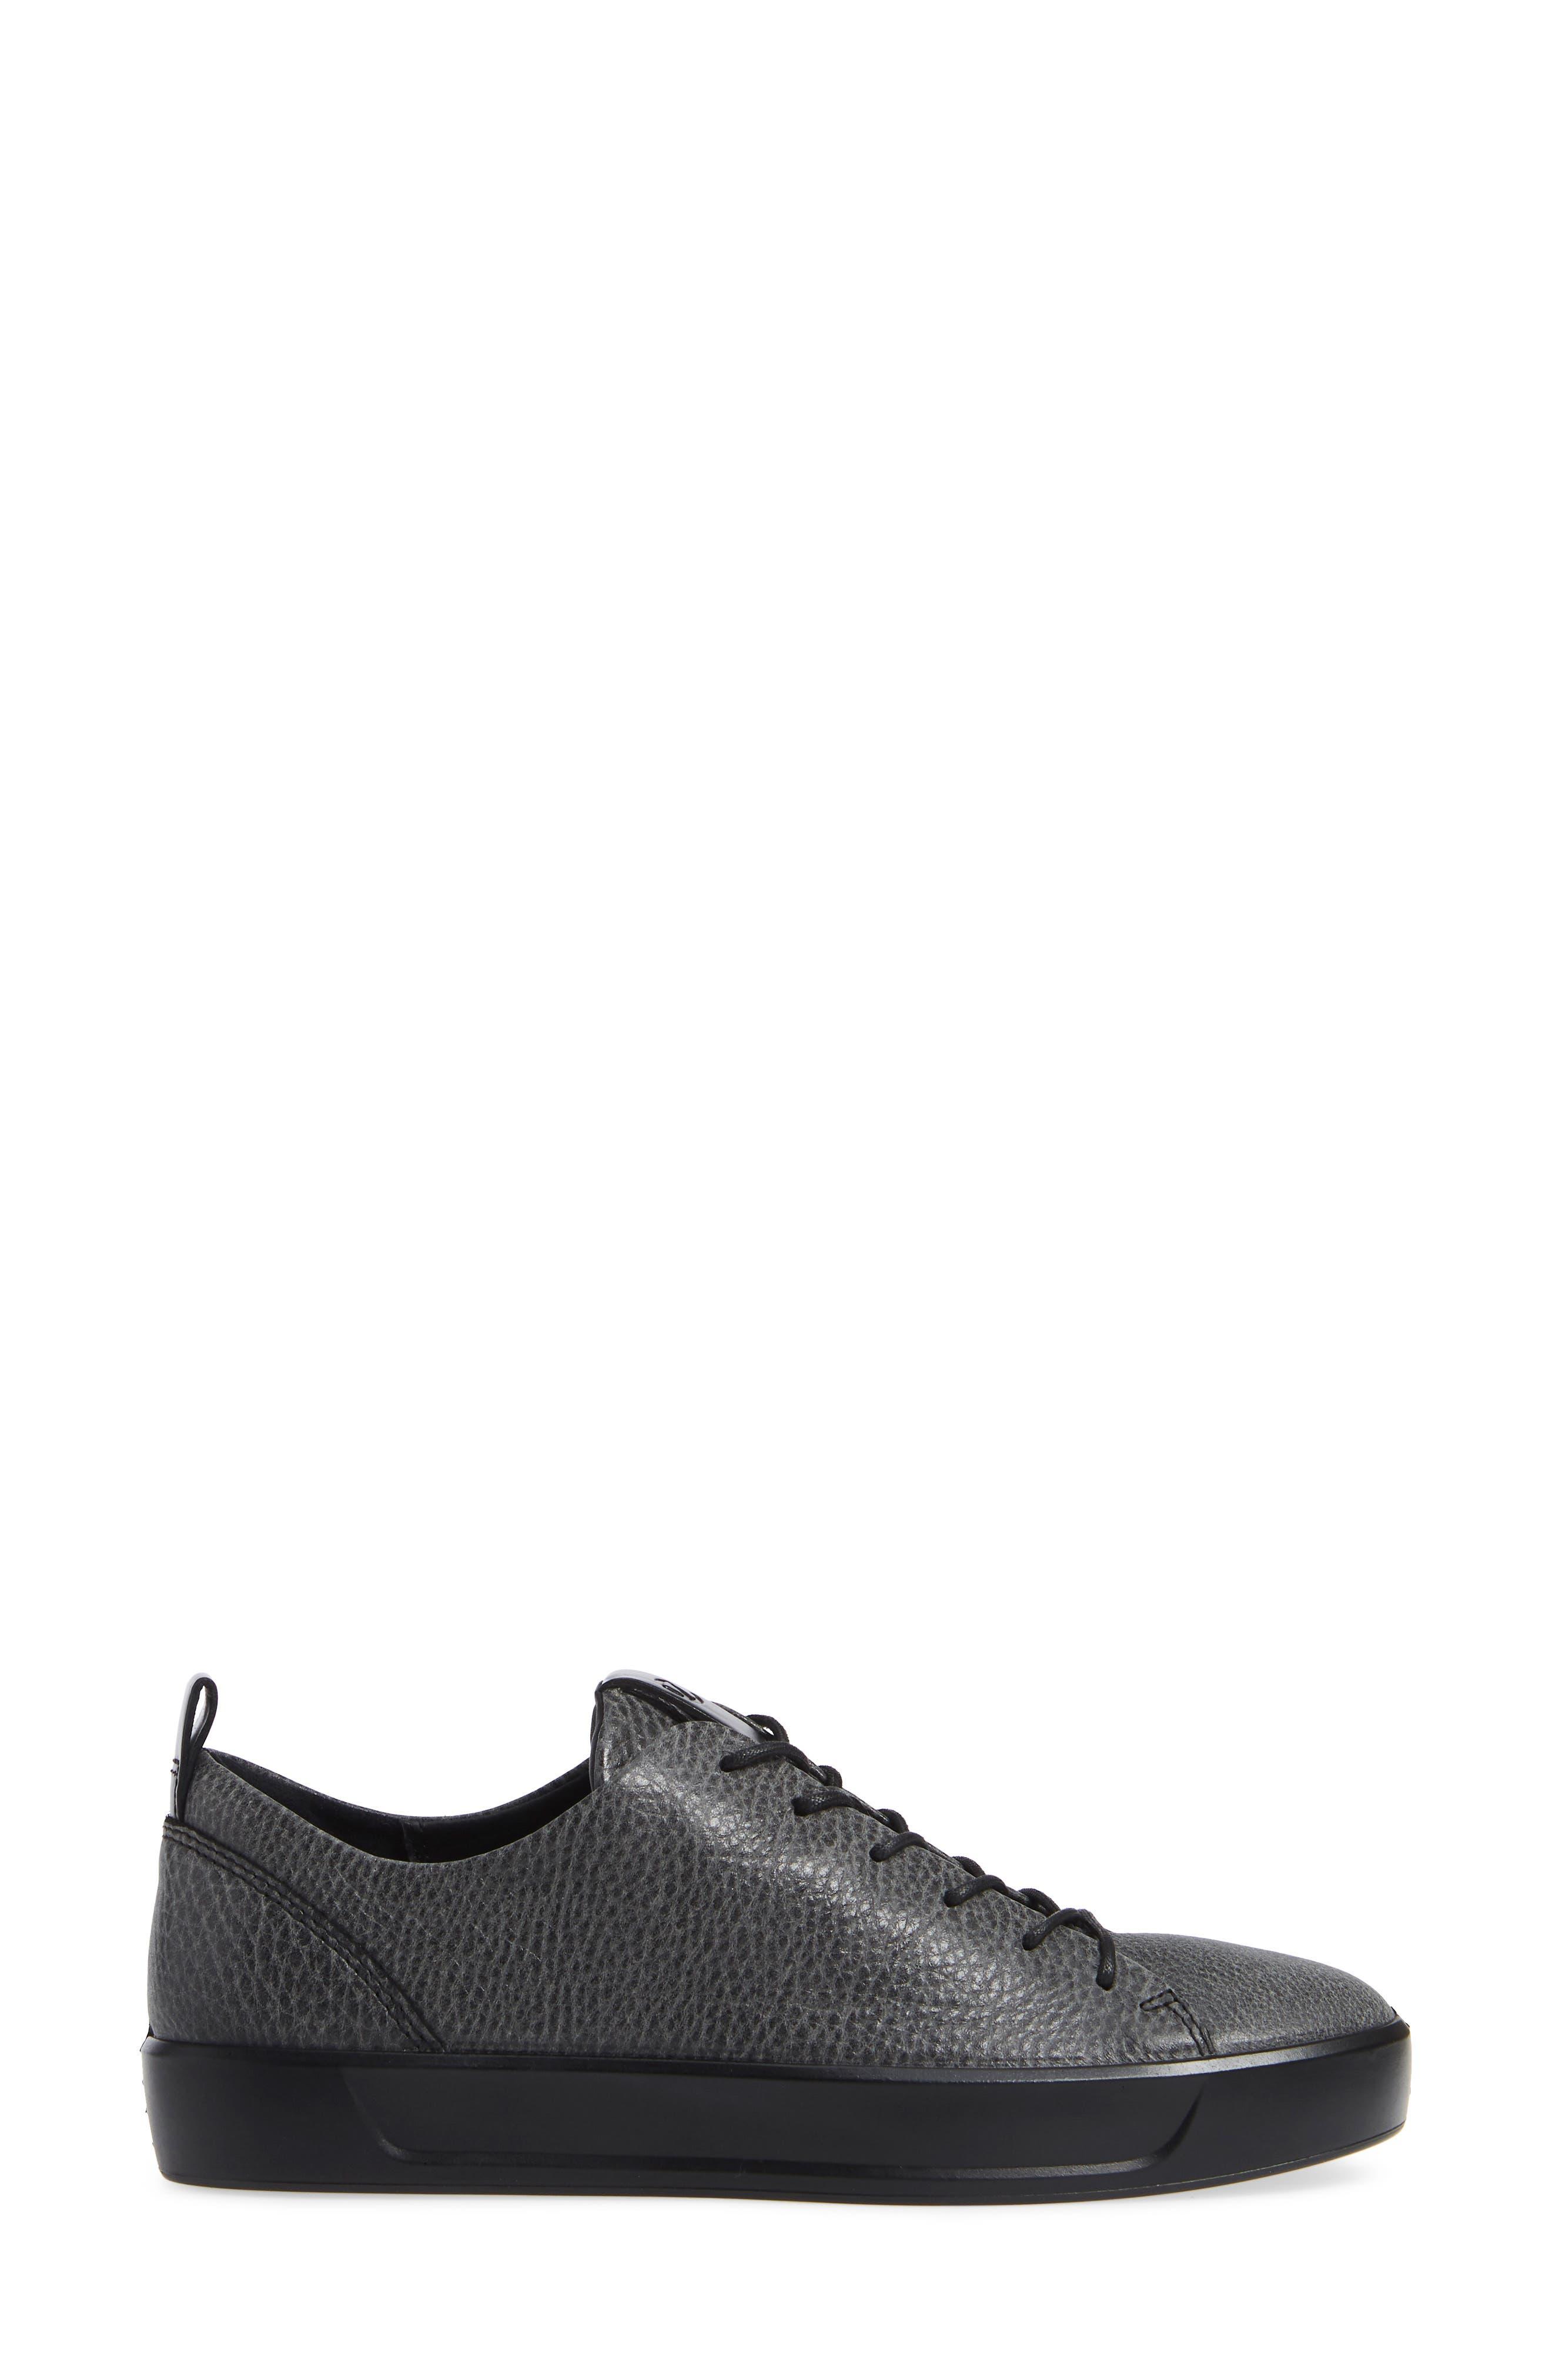 Soft 8 Sneaker,                             Alternate thumbnail 3, color,                             BLACK/ BLACK LEATHER